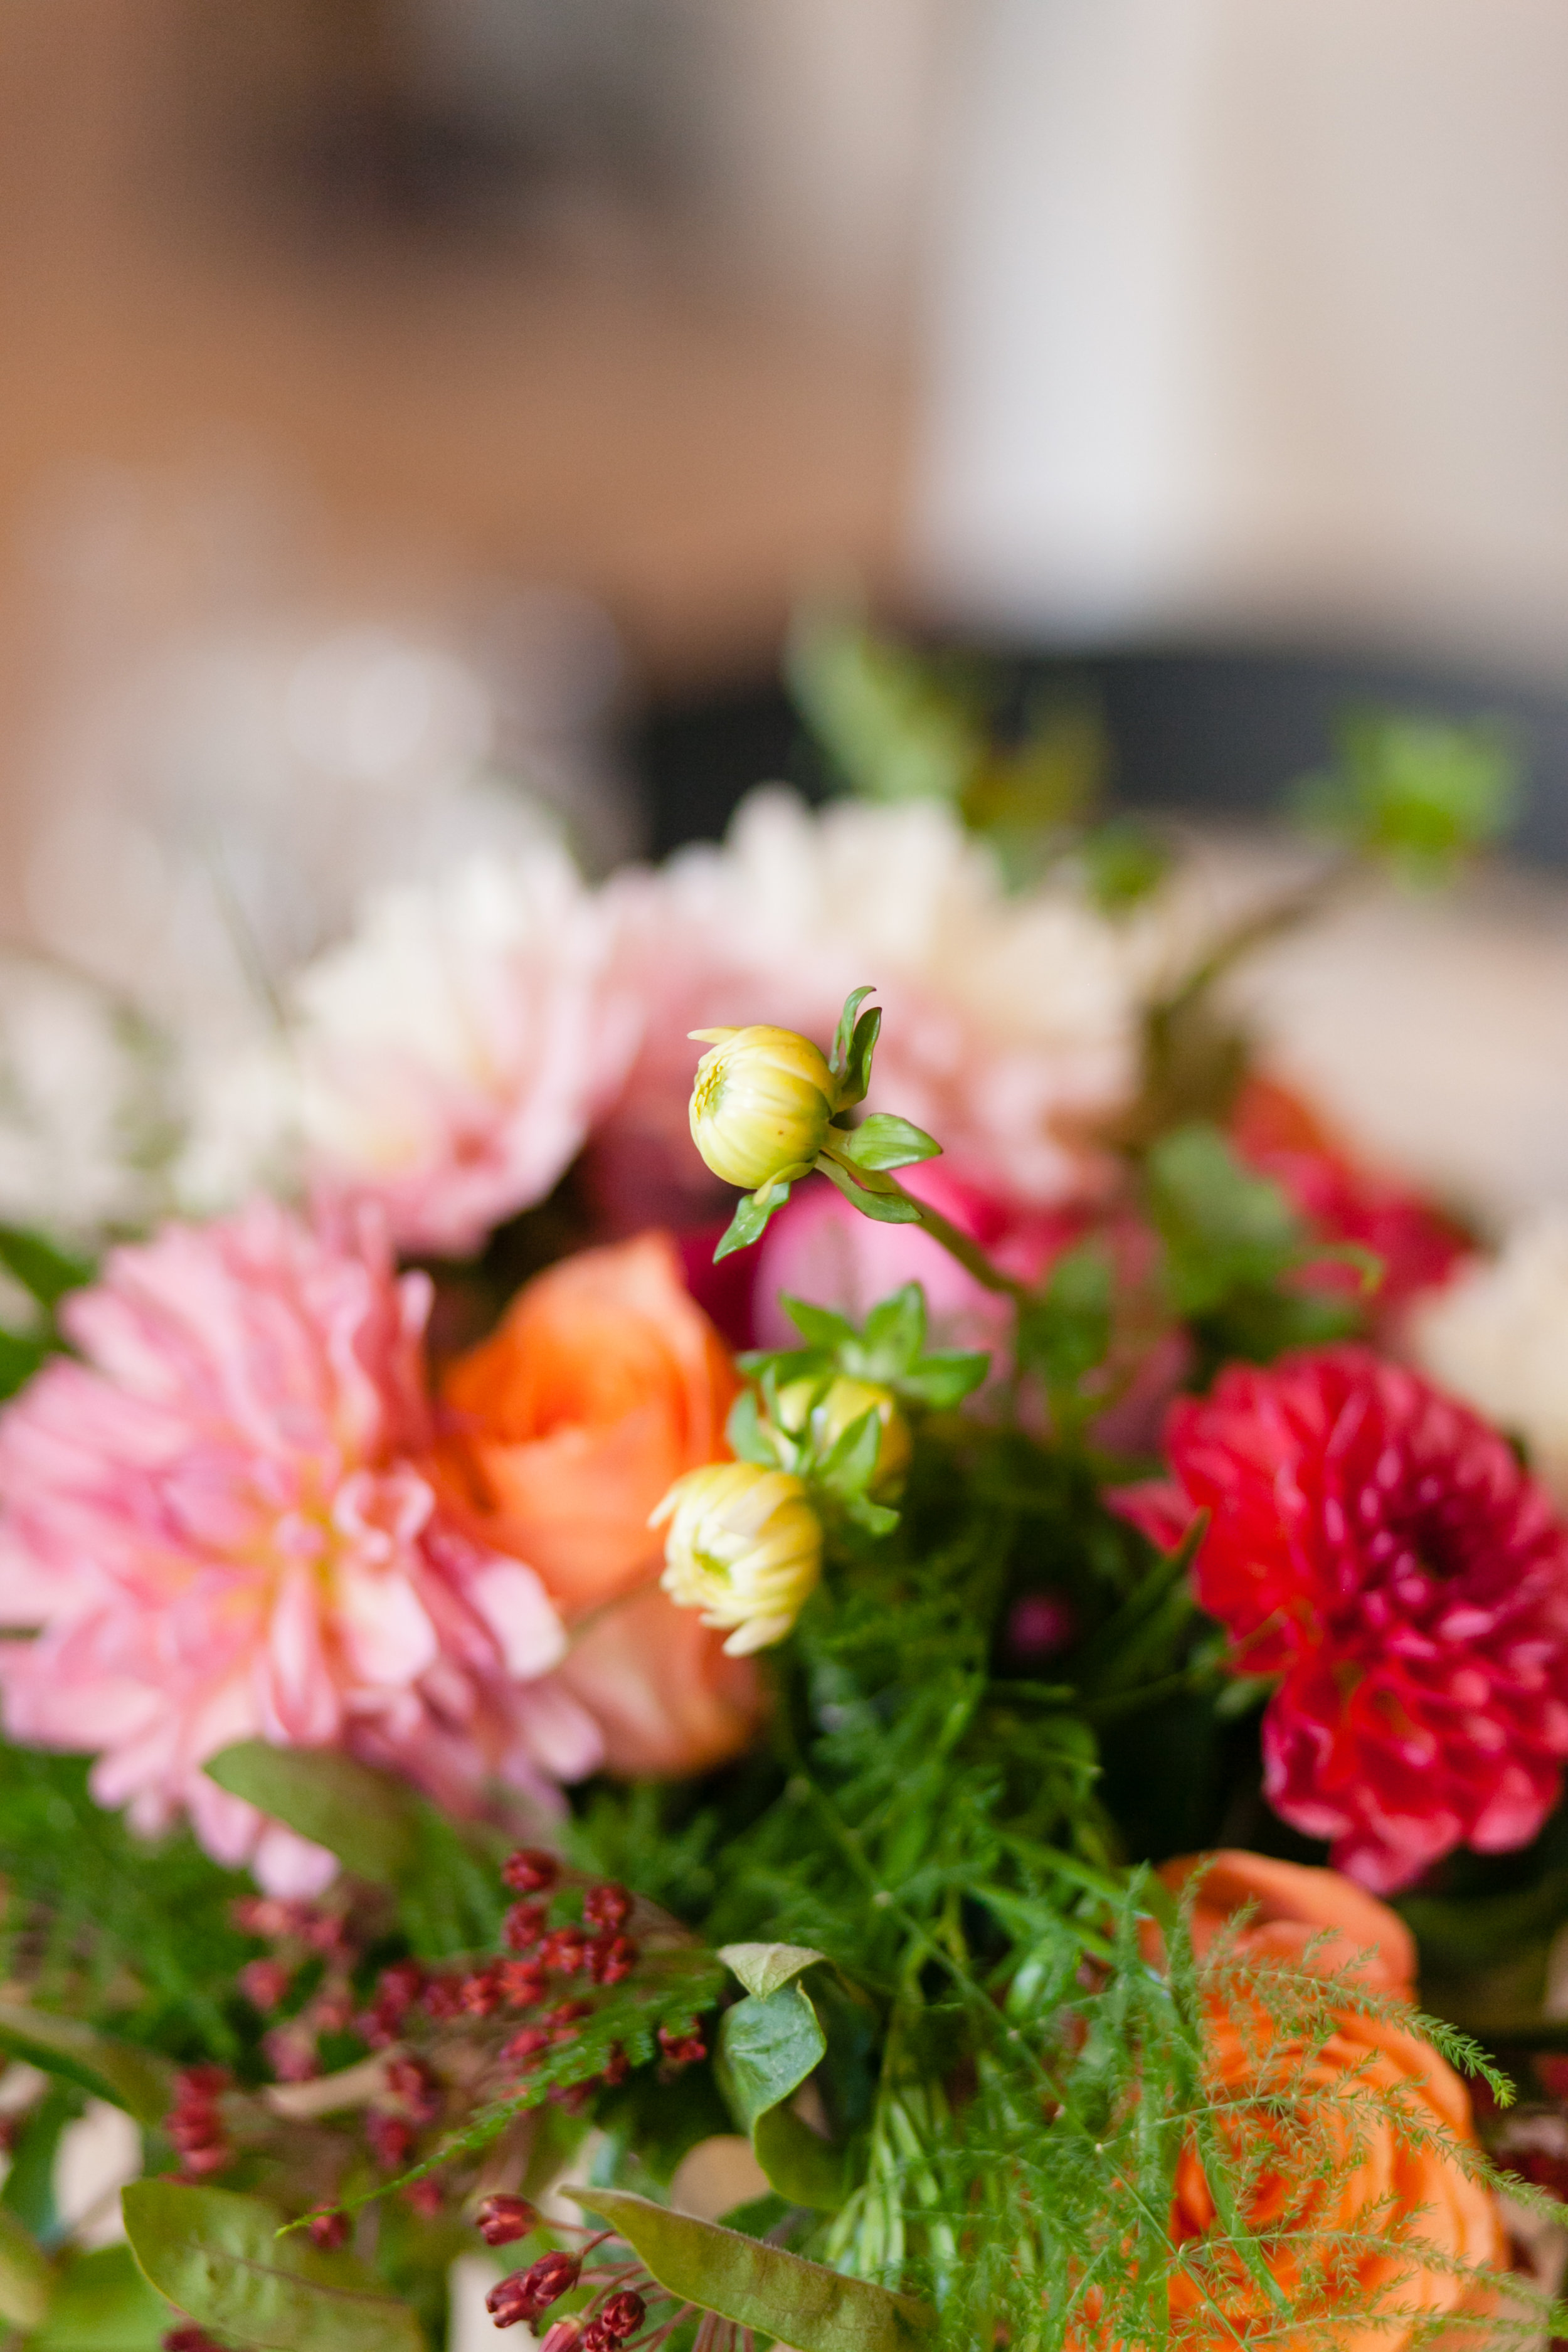 Vendors:Photographer: Laura Ivanova | Invitations: Minted | Ceremony Venue: Hennepin Avenue United Methodist Church | Reception Venue: James J. Hill Center | Flowers: Molly's Flower Studio | Hair/MakeUp Artist: Warpaint Beauty Agency | Bride's Dress: BHLDN | Men's Attire: Hugo Boss | Linens/Decor/Rentals: Apres Party and Tent | Entertainment: Adagio Entertainment | Catering: Green Mangos Catering | Bar: Mintahoe | Cake: Sweet Retreat MN | Transportation: Northfield Lines , Eclipse Limos & Valley Limos